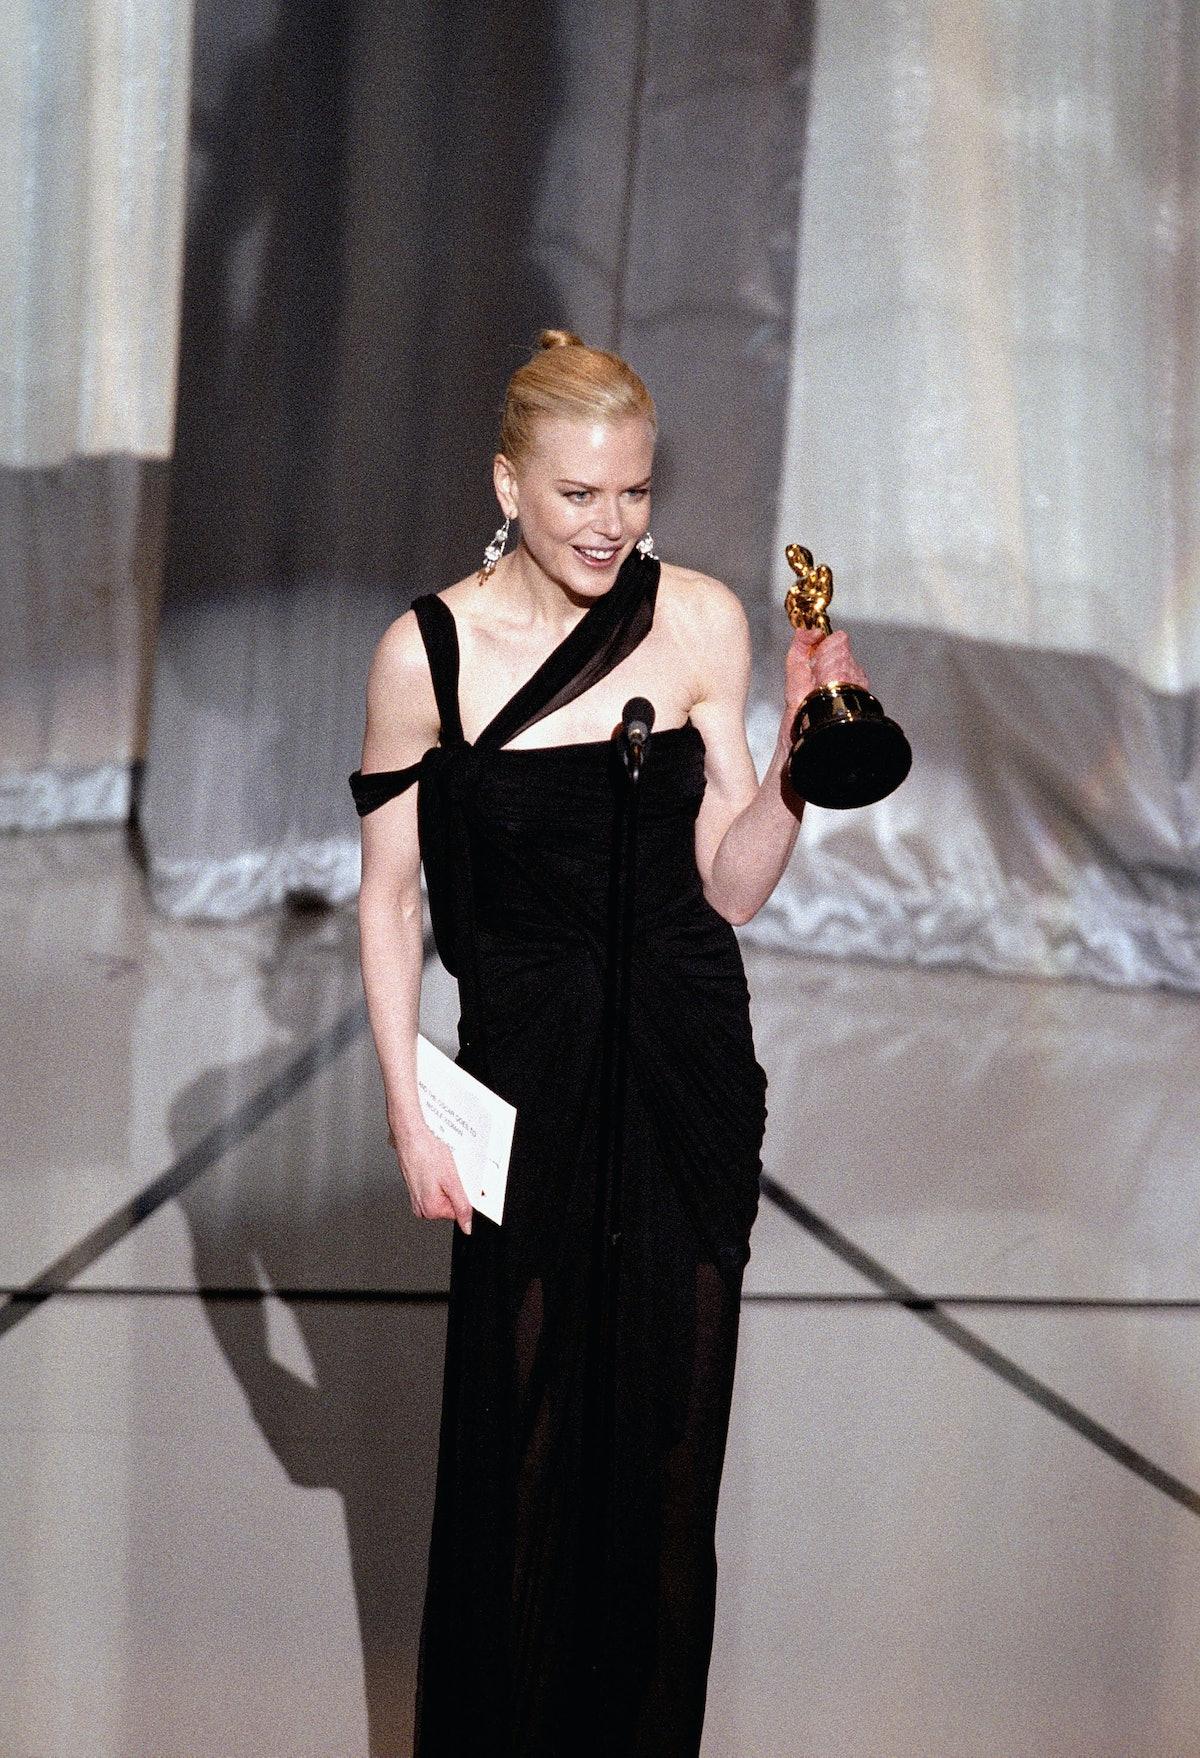 Nicole Kidman Accepts Her Oscar.